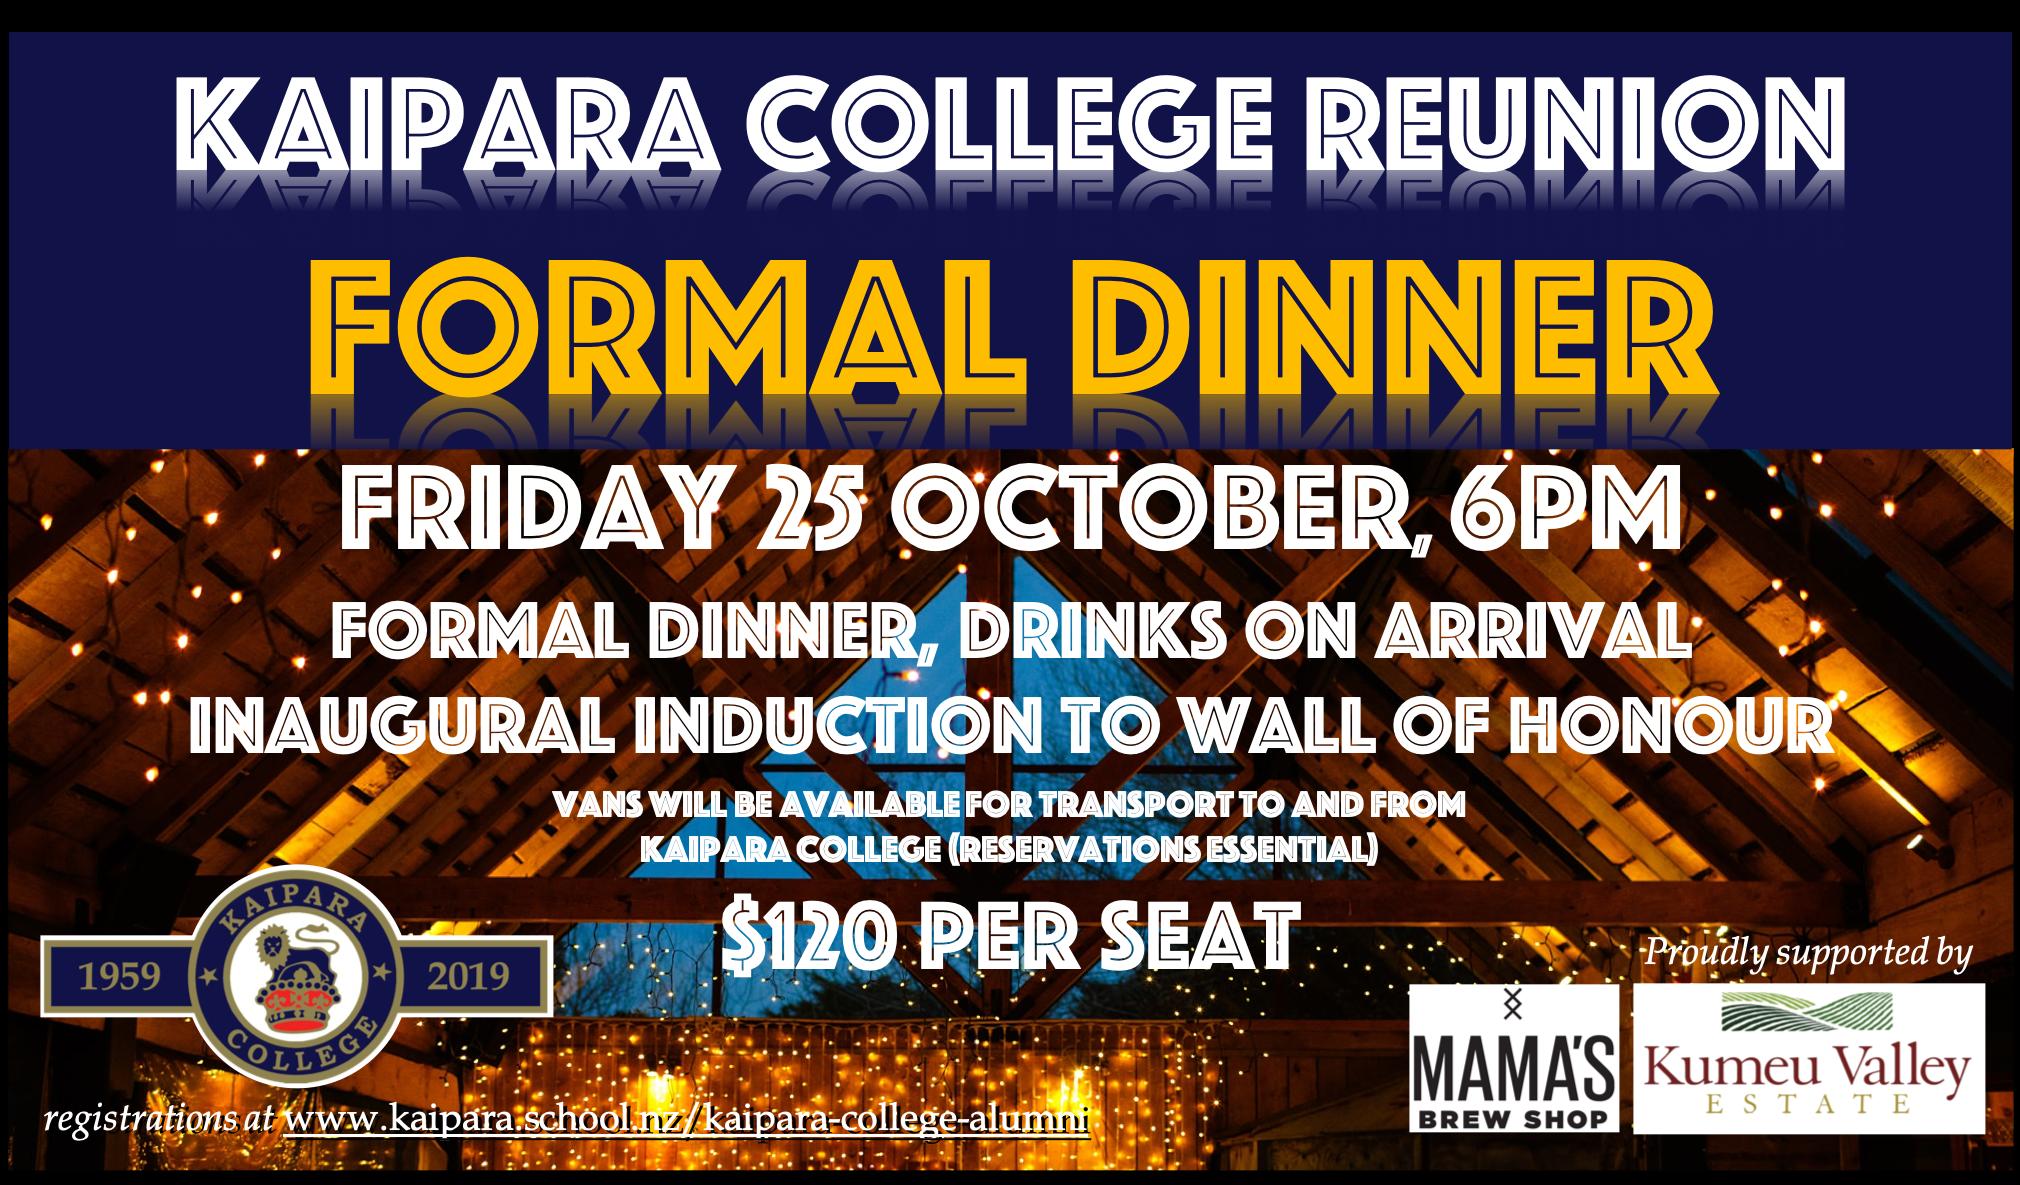 Reunion Formal Dinner